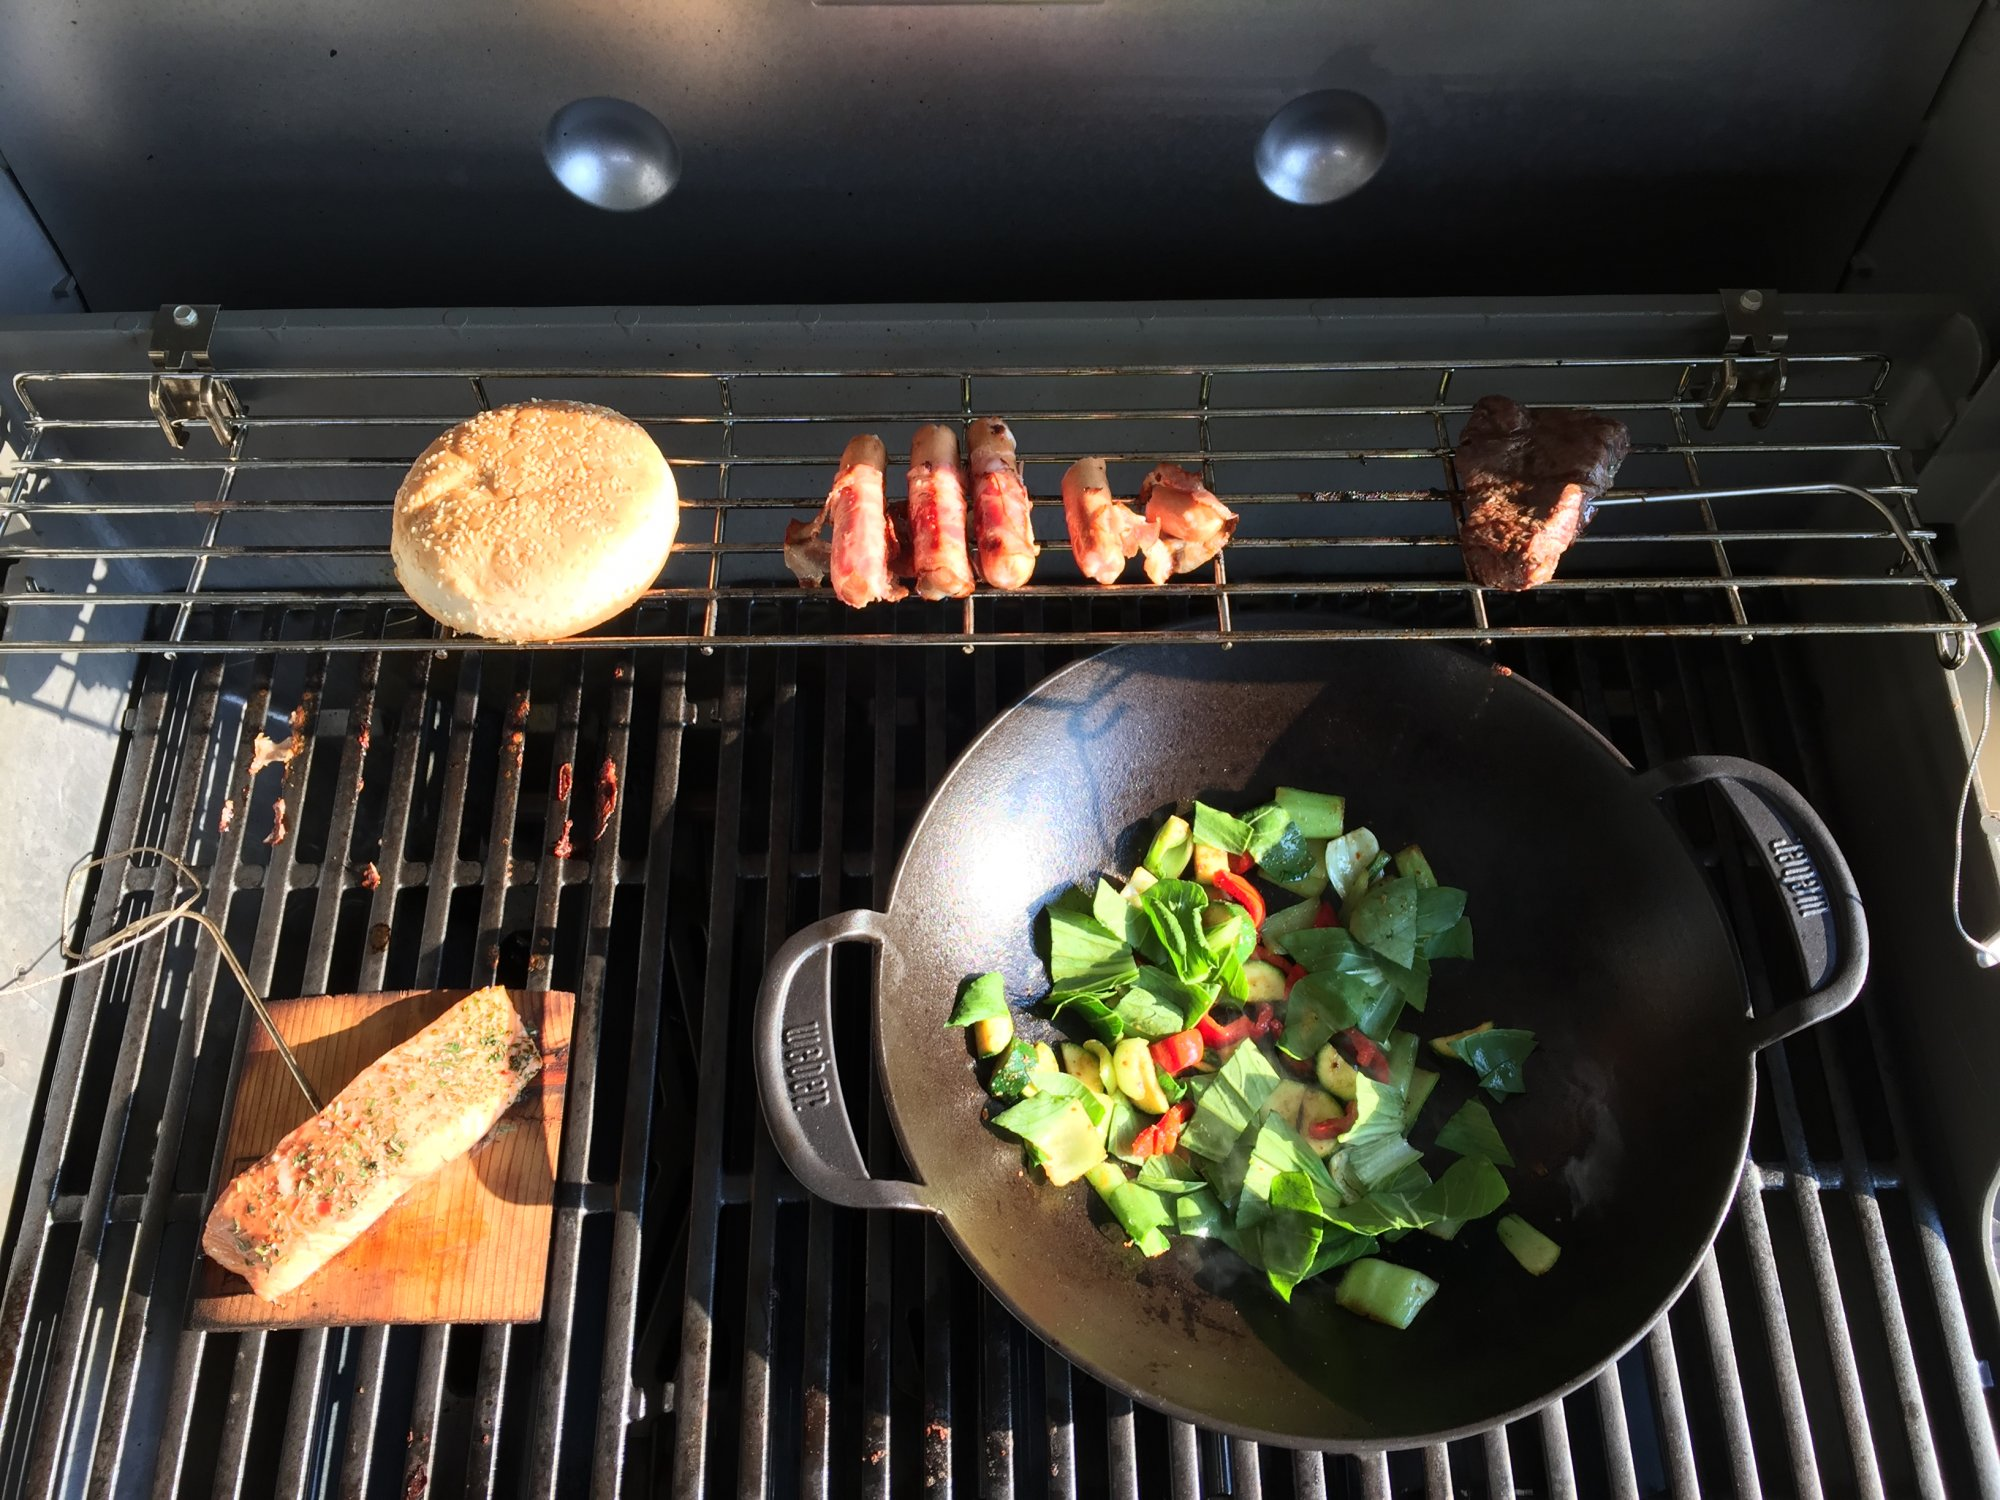 Enders Gasgrill Wok : Weber grill wok attachment all products weber original gourmet